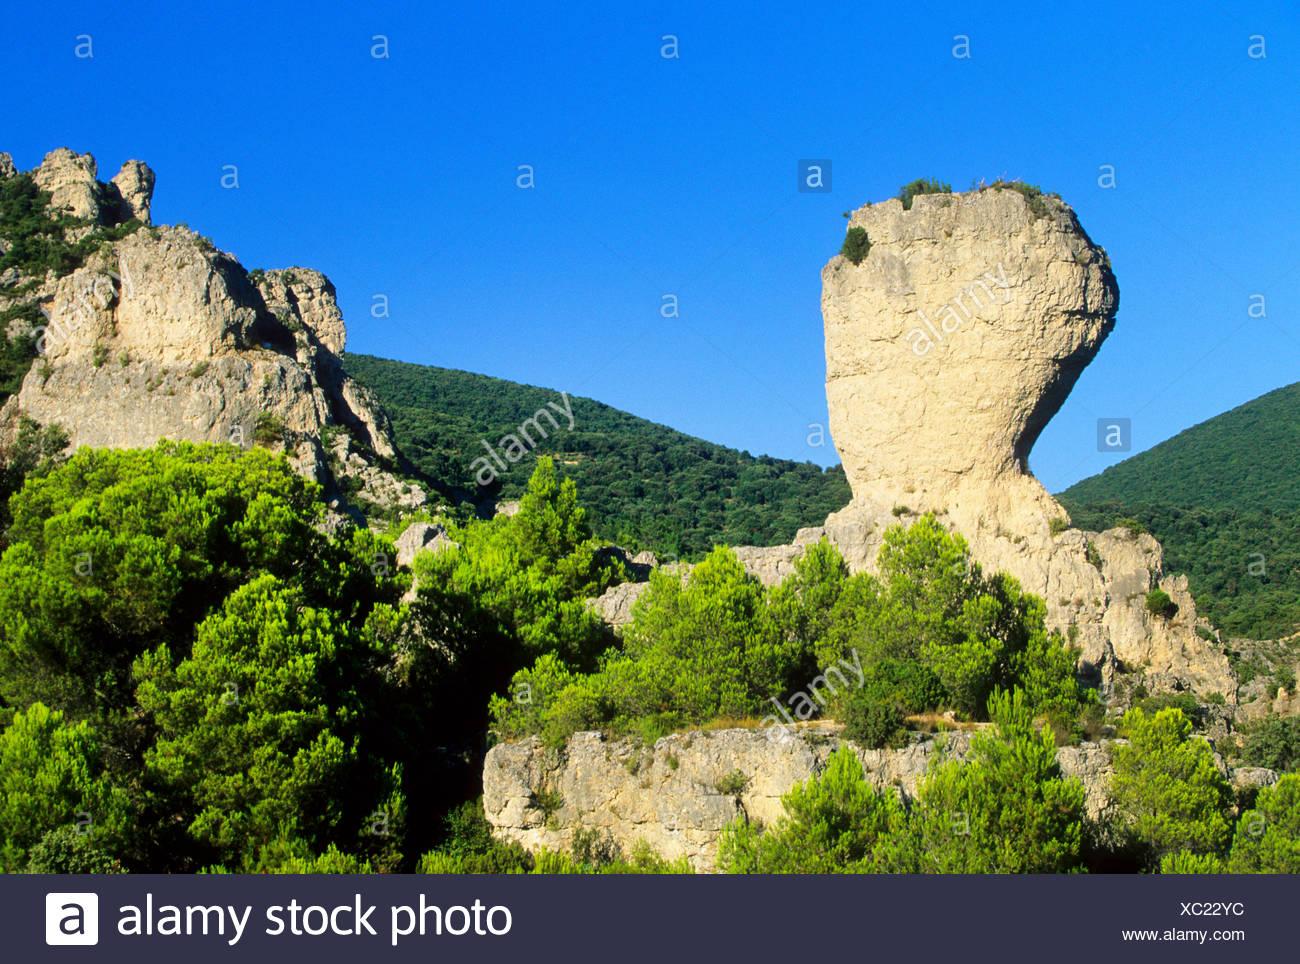 Extraña formación rocosa de Mourez Herault, Francia Foto de stock